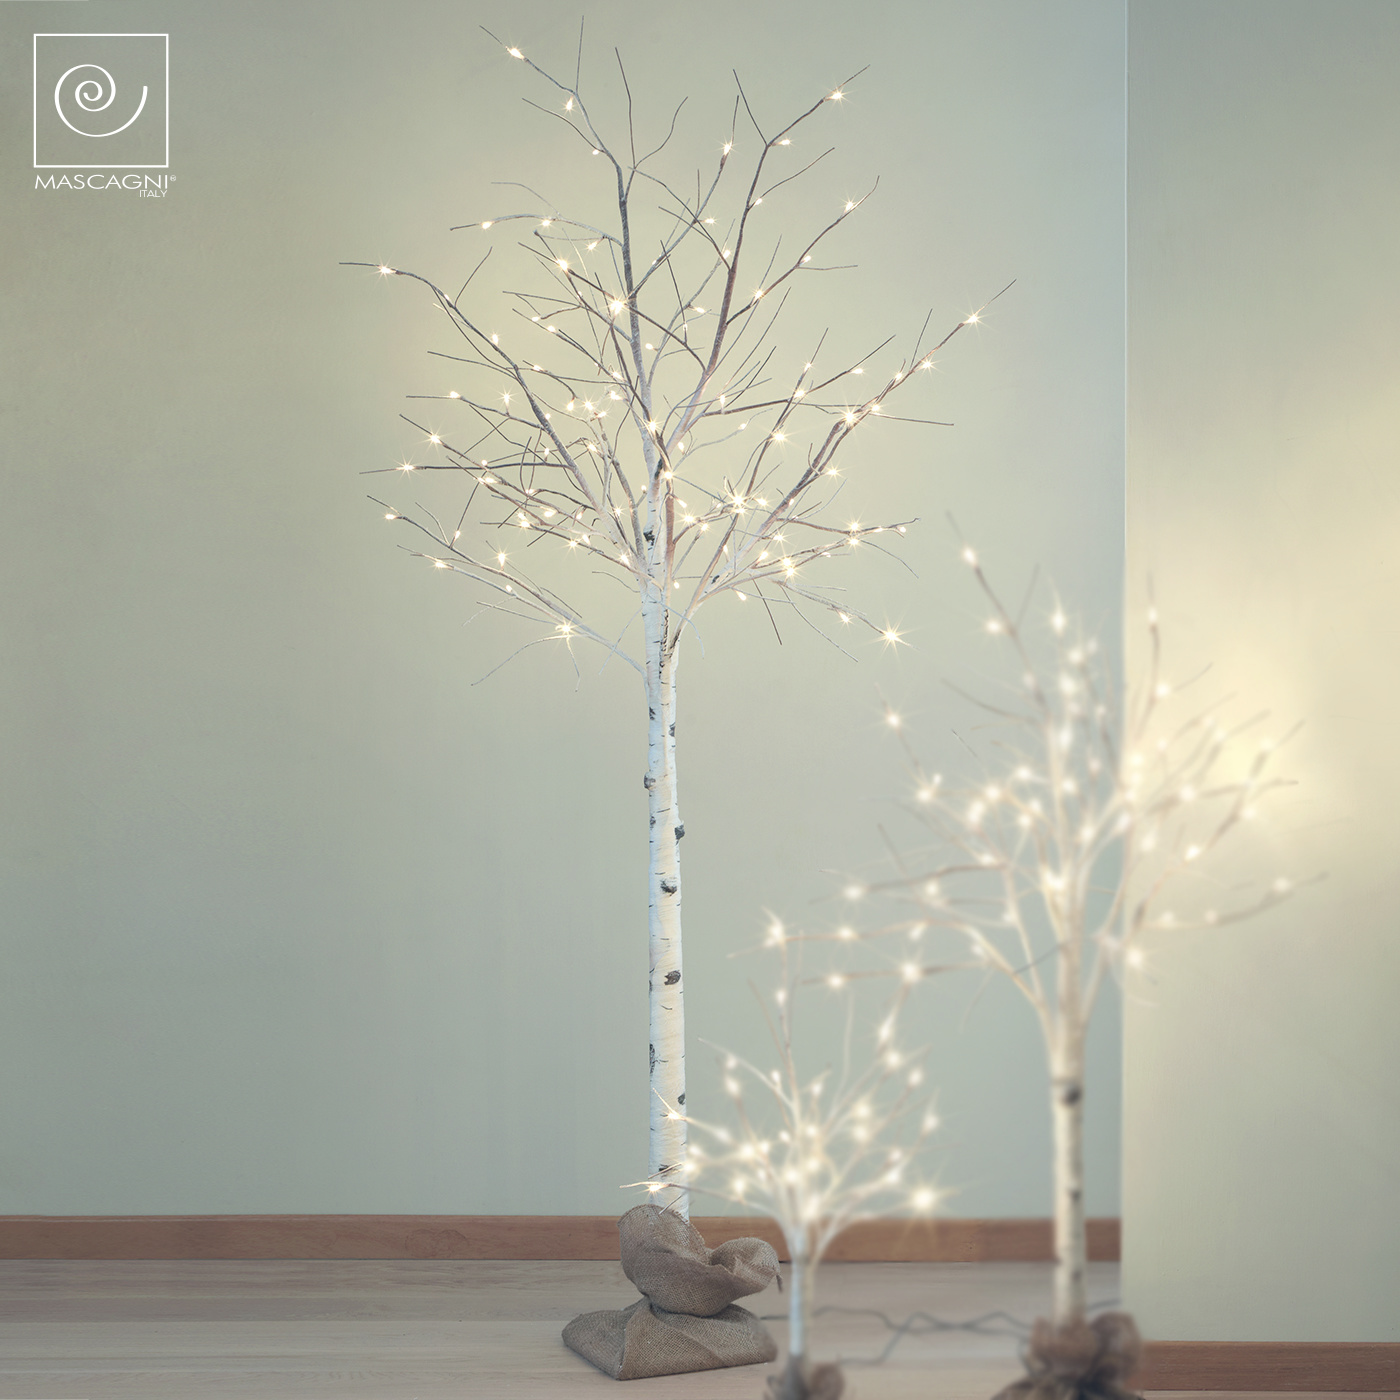 Art Mascagni LED TREE CM.200